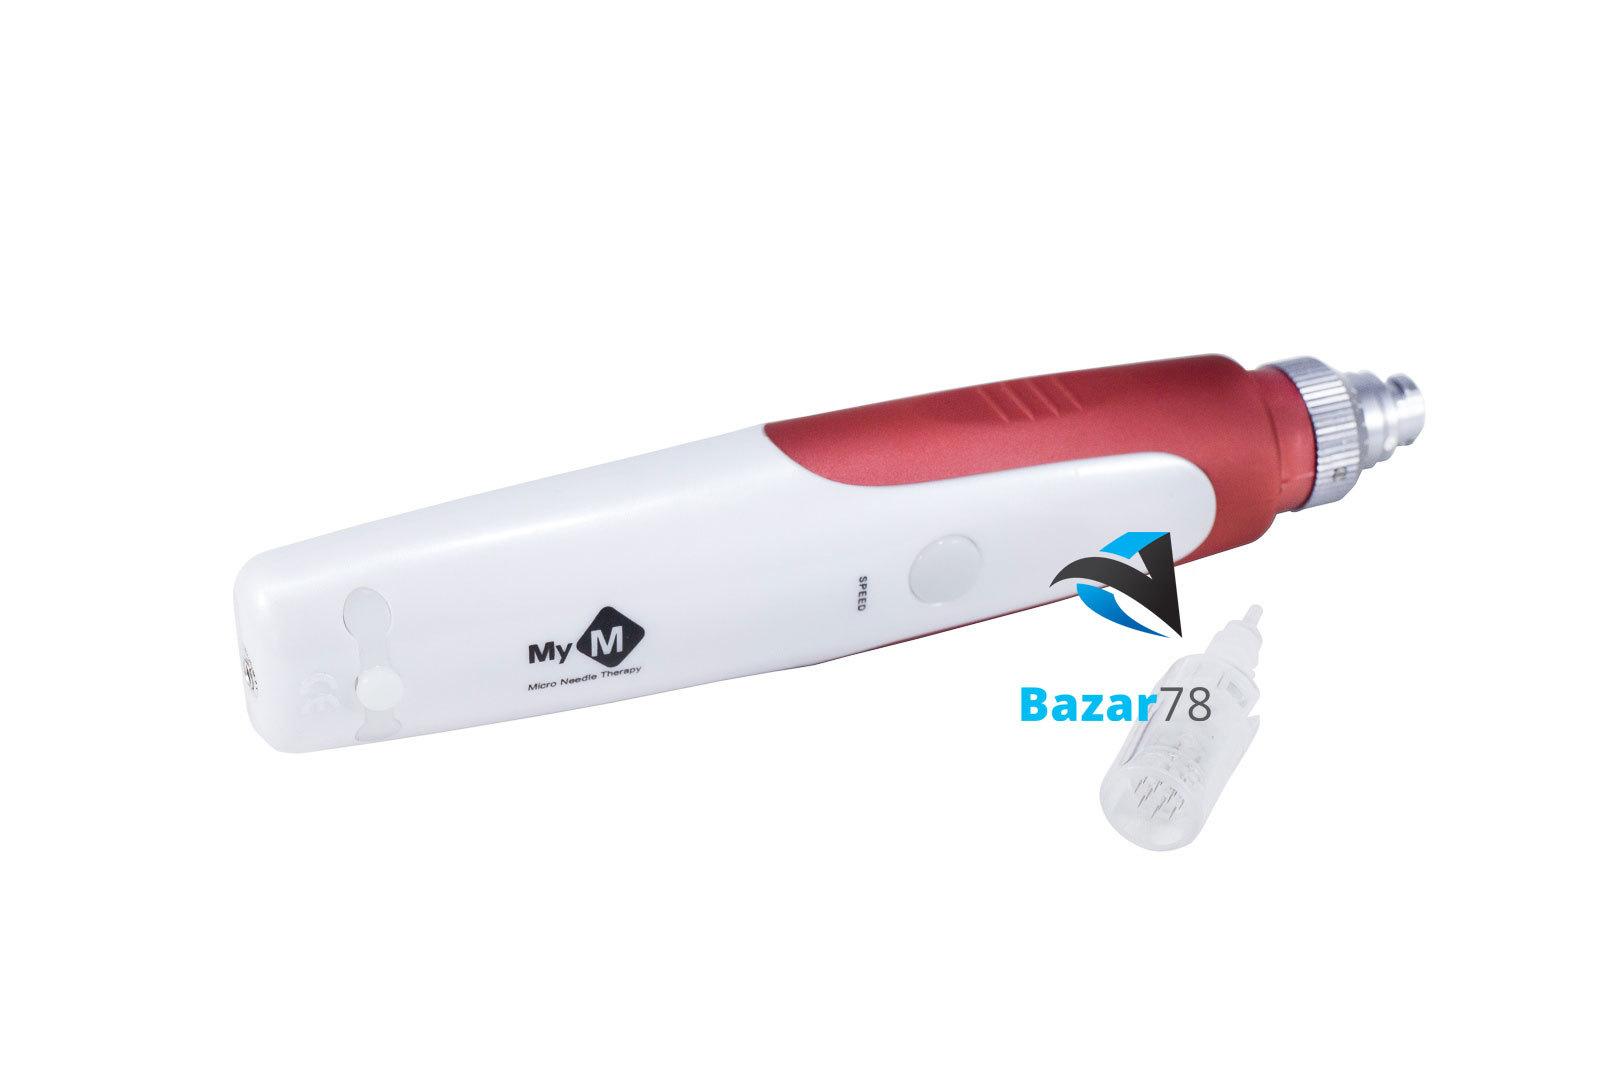 Аппарат для BB Glow фракционной мезотерапии My-M DermaPen